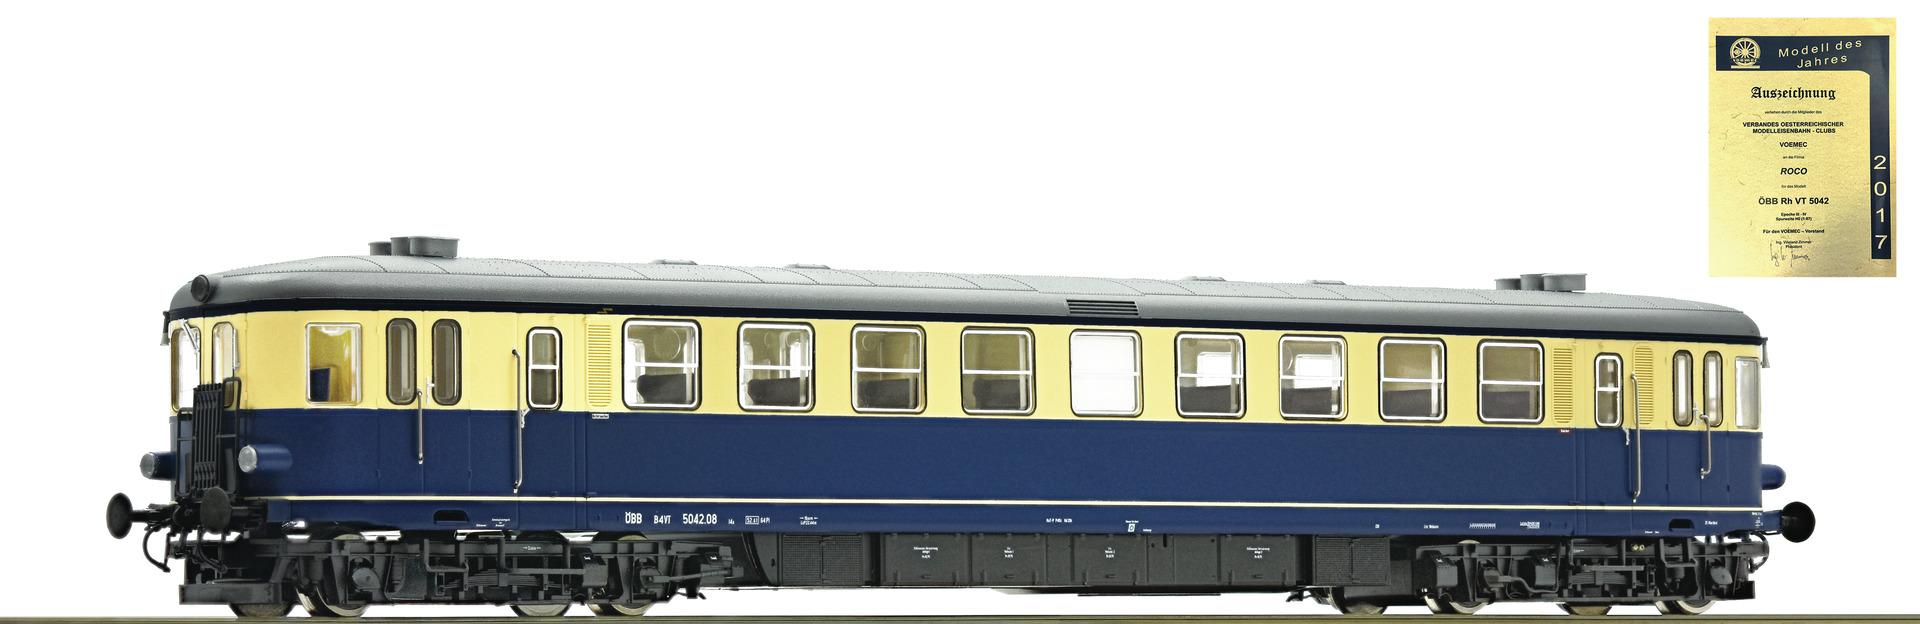 Roco 73143 Dieseltriebwag.Rh 5042 ÖBB Snd